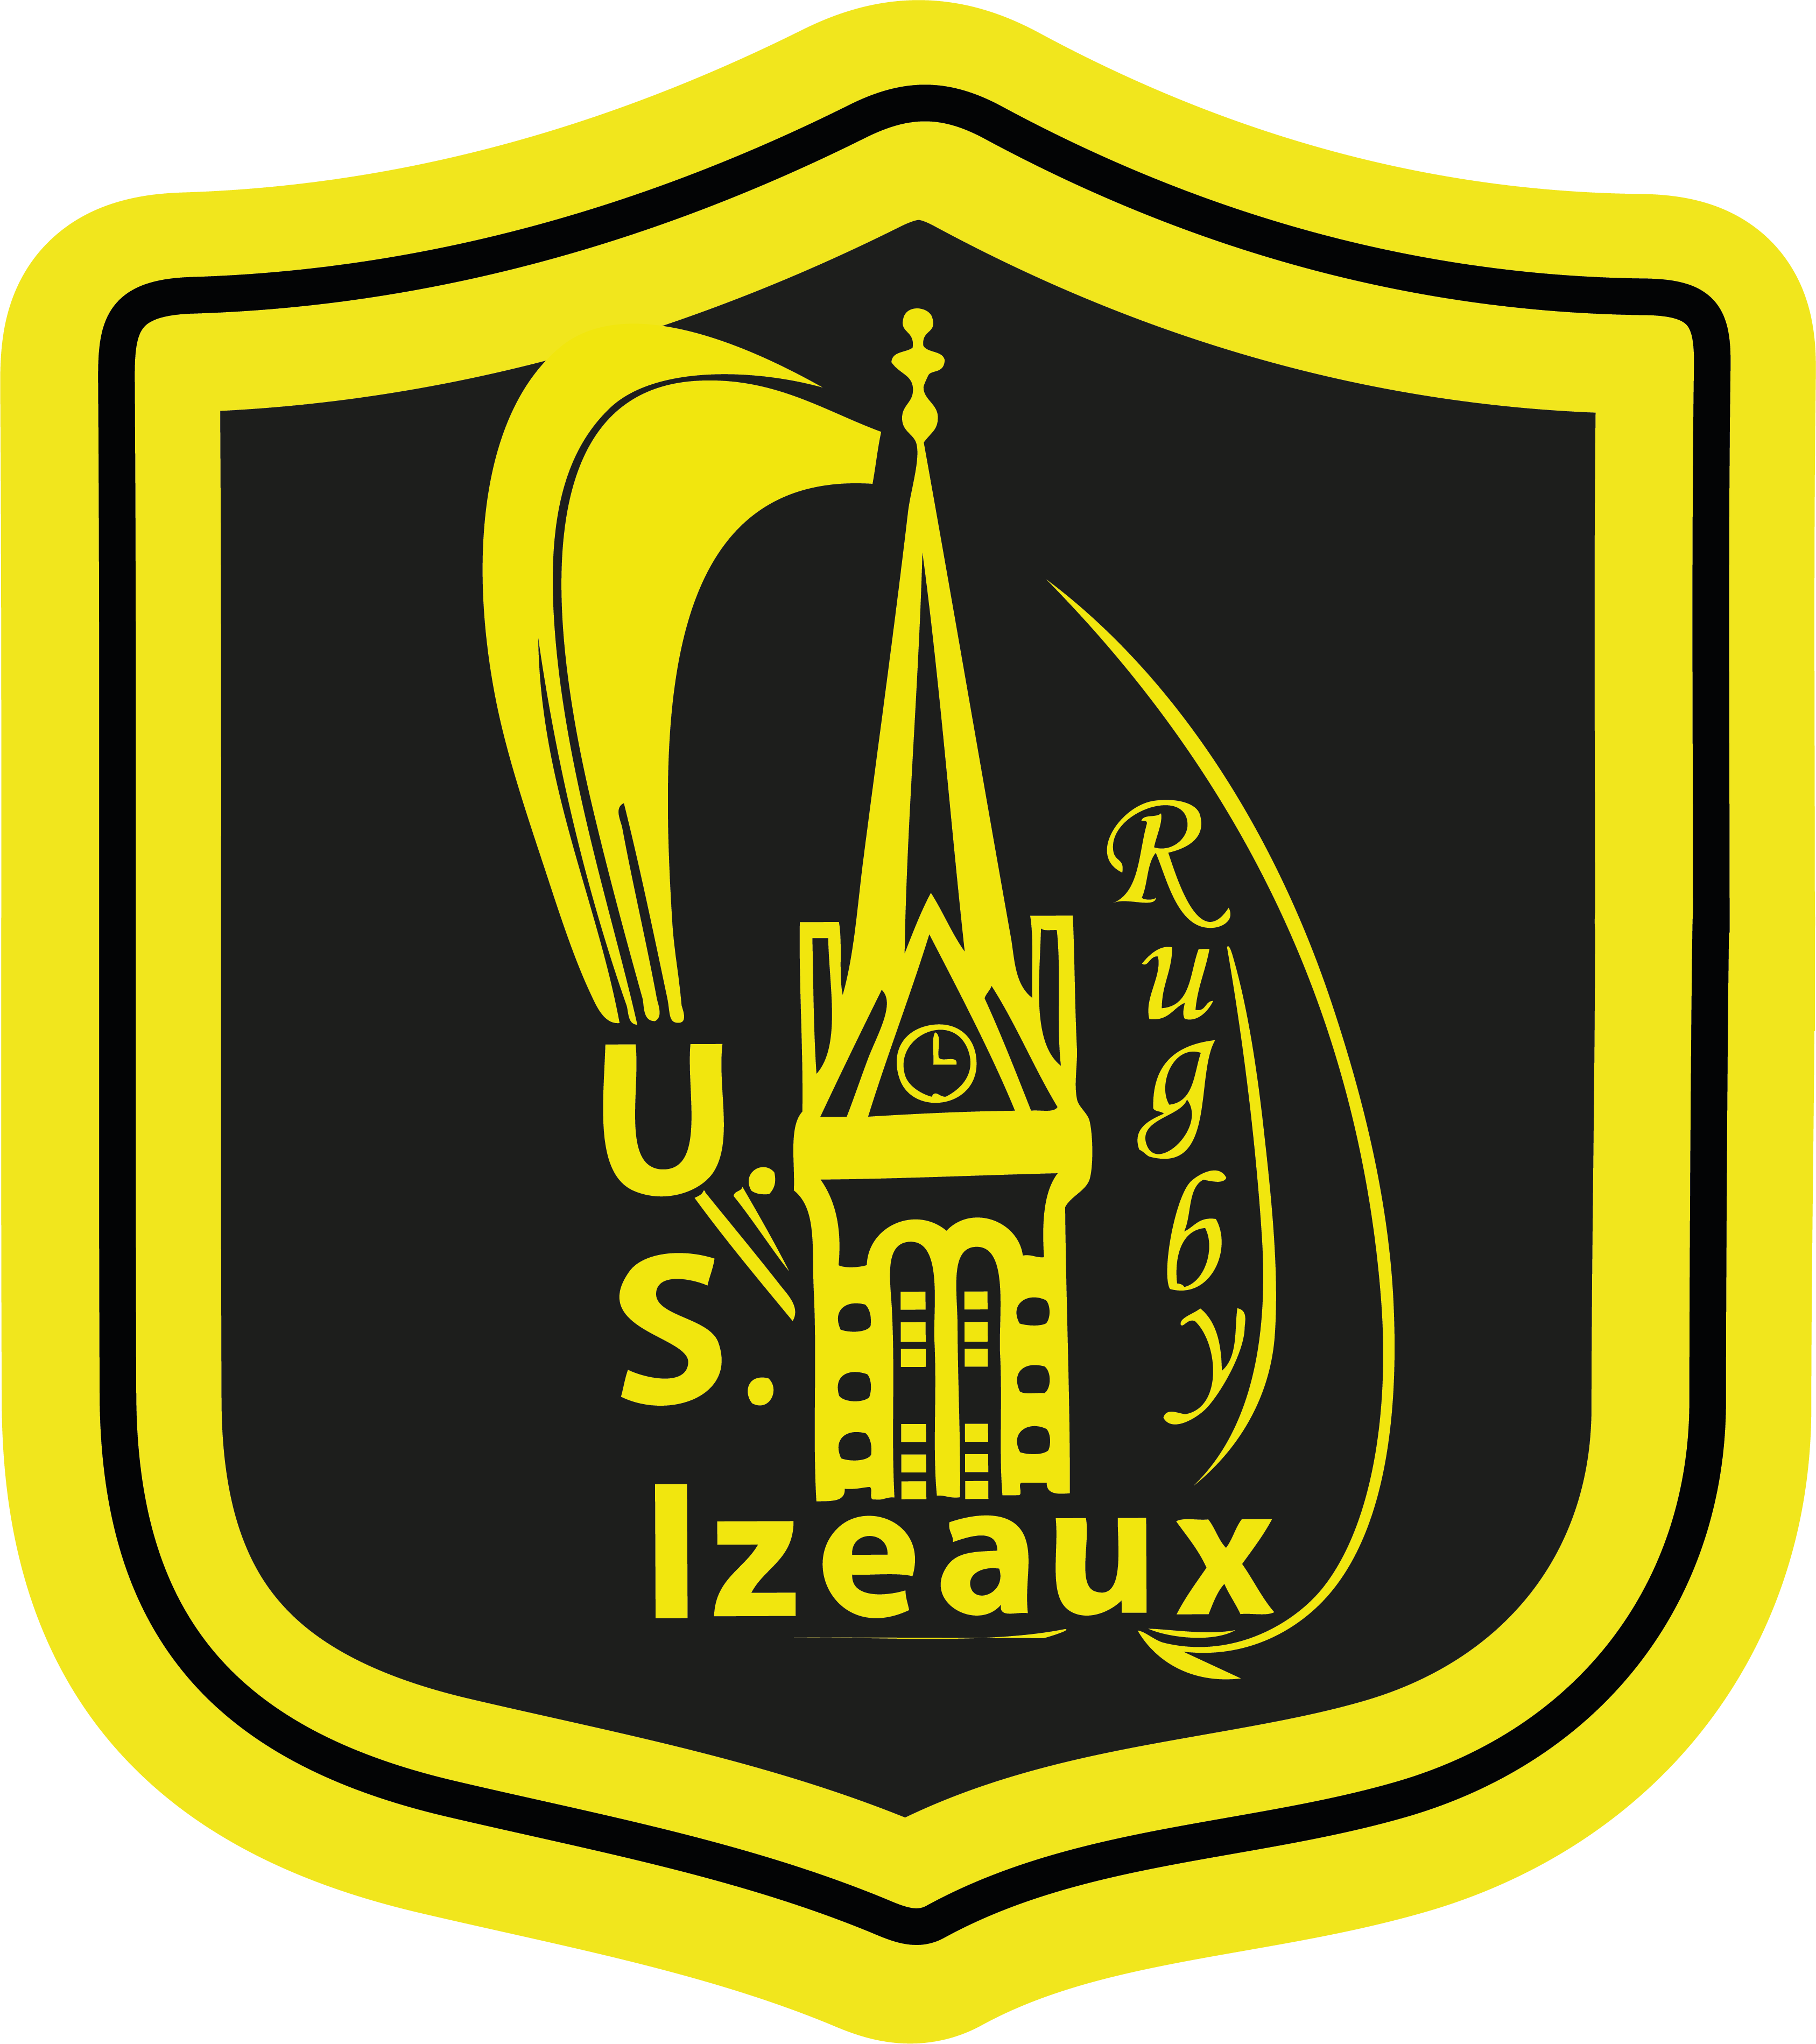 Izeaux